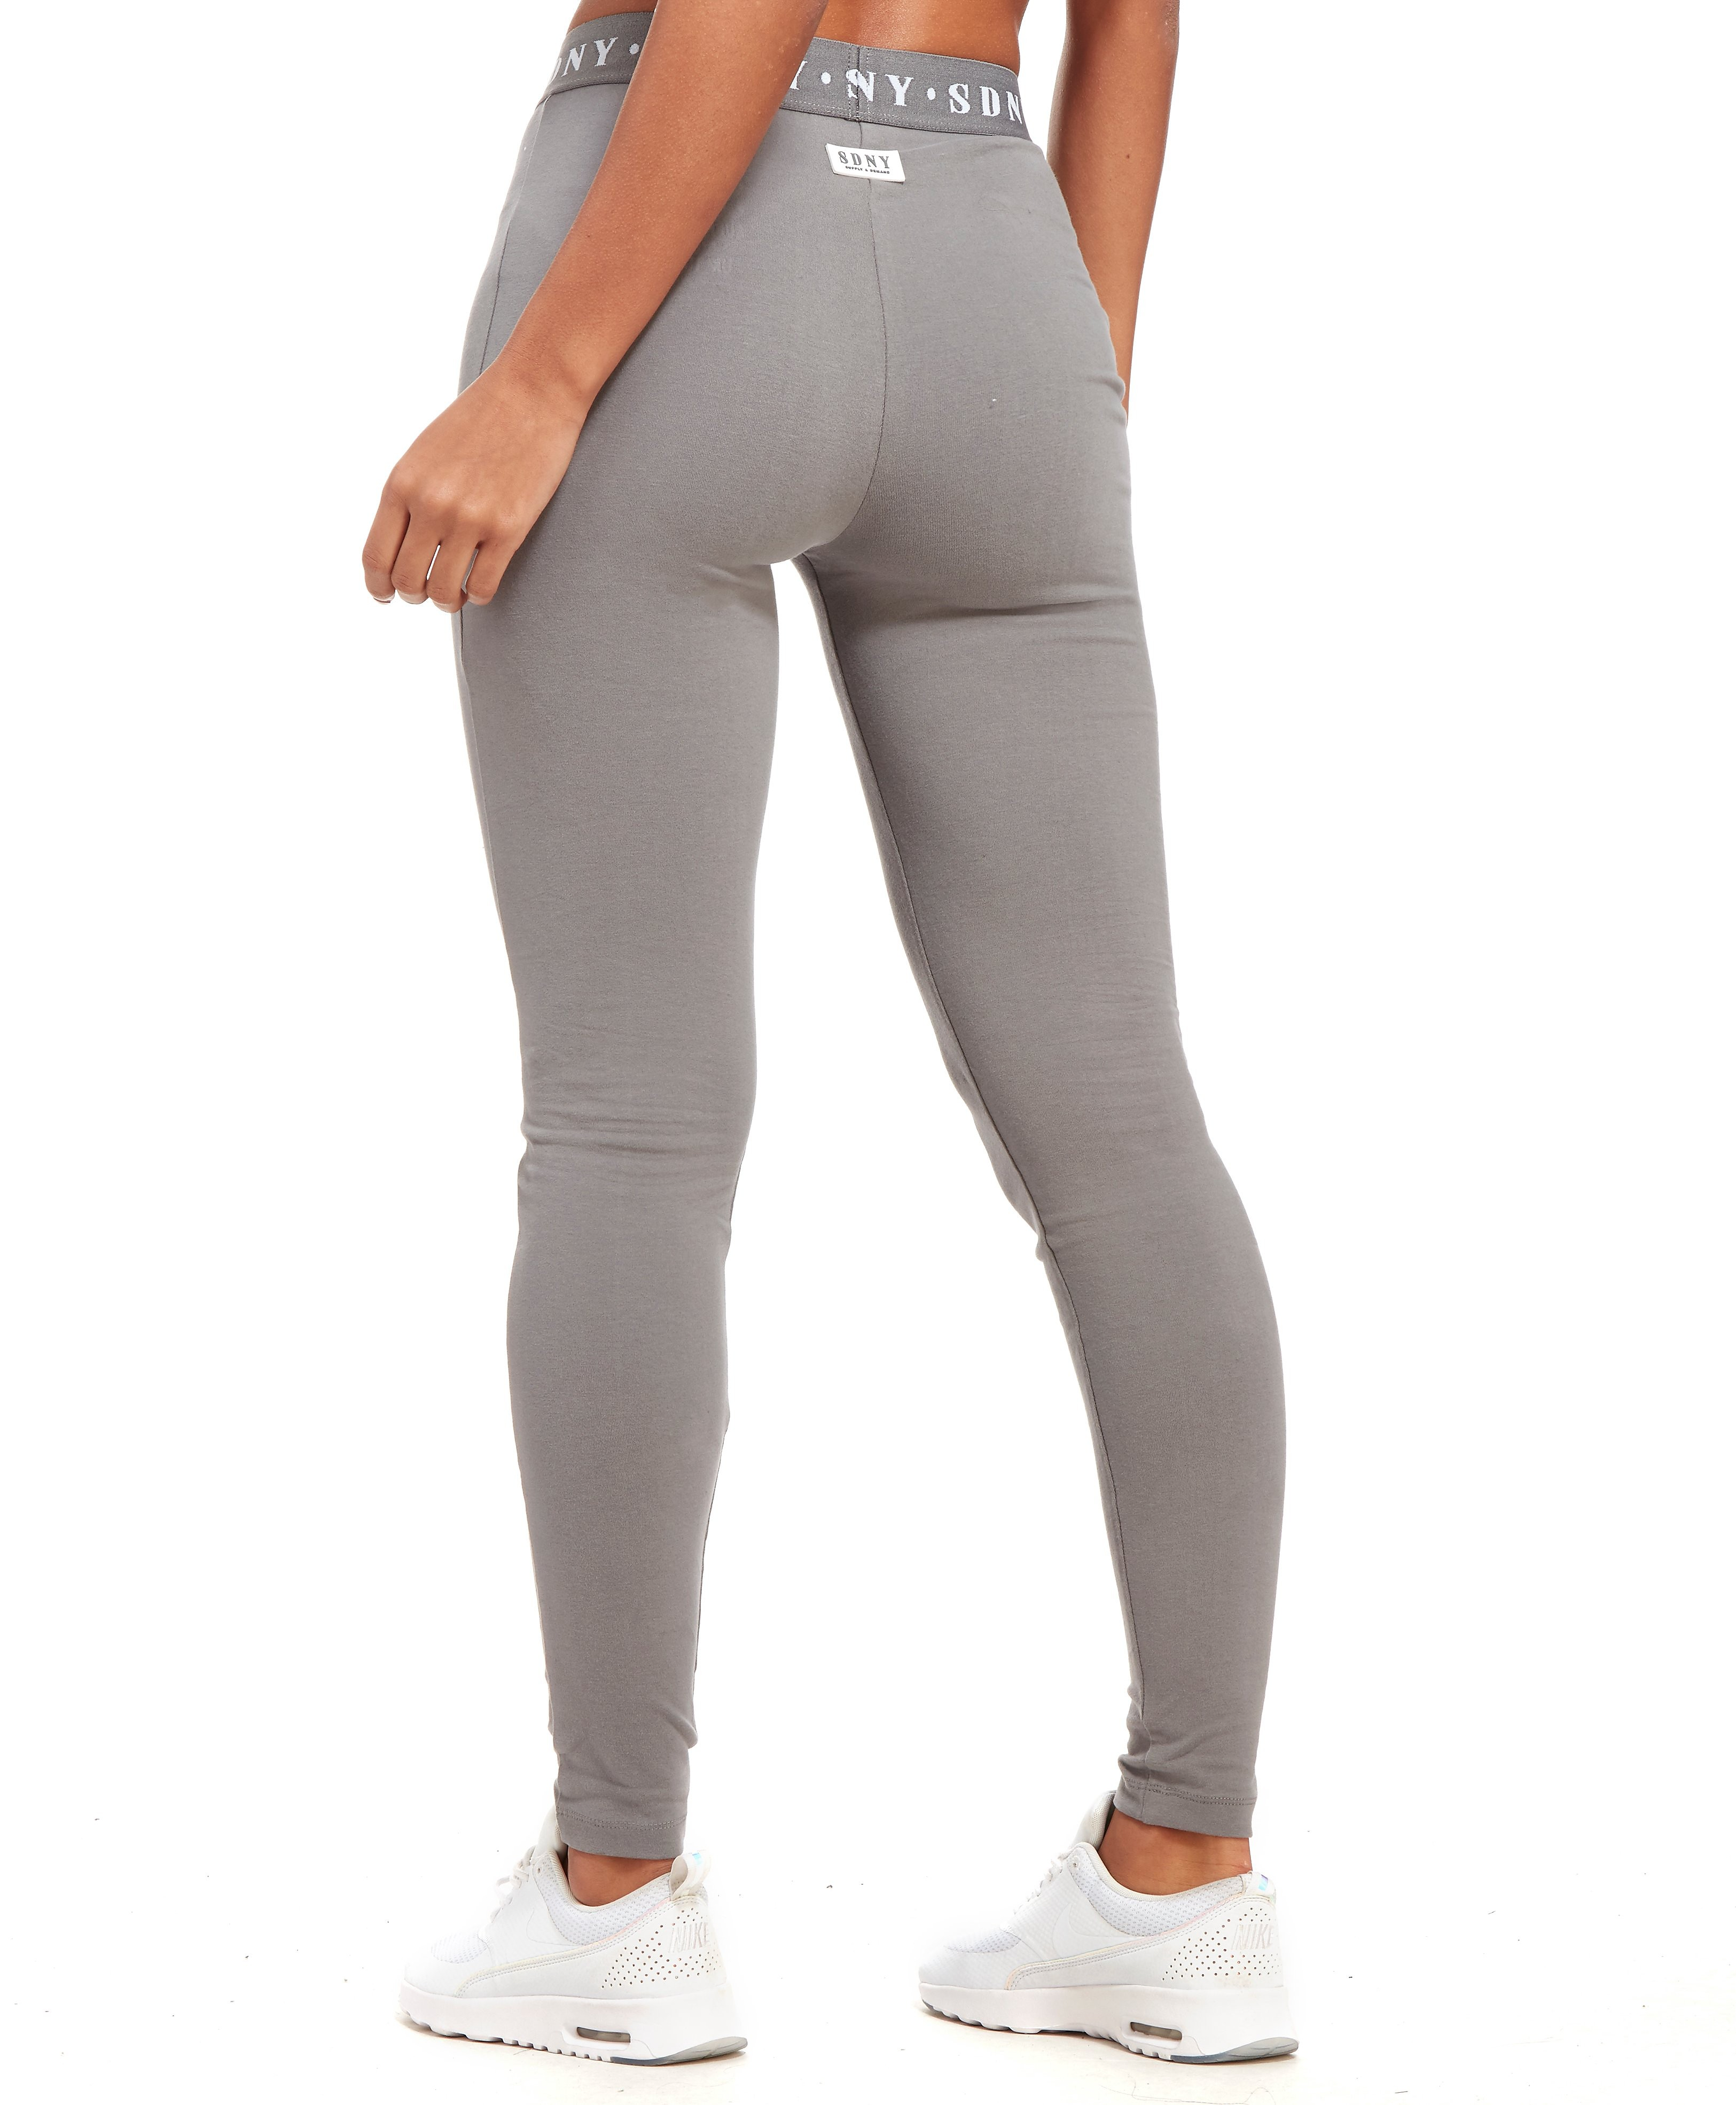 Supply & Demand Grey Leggings